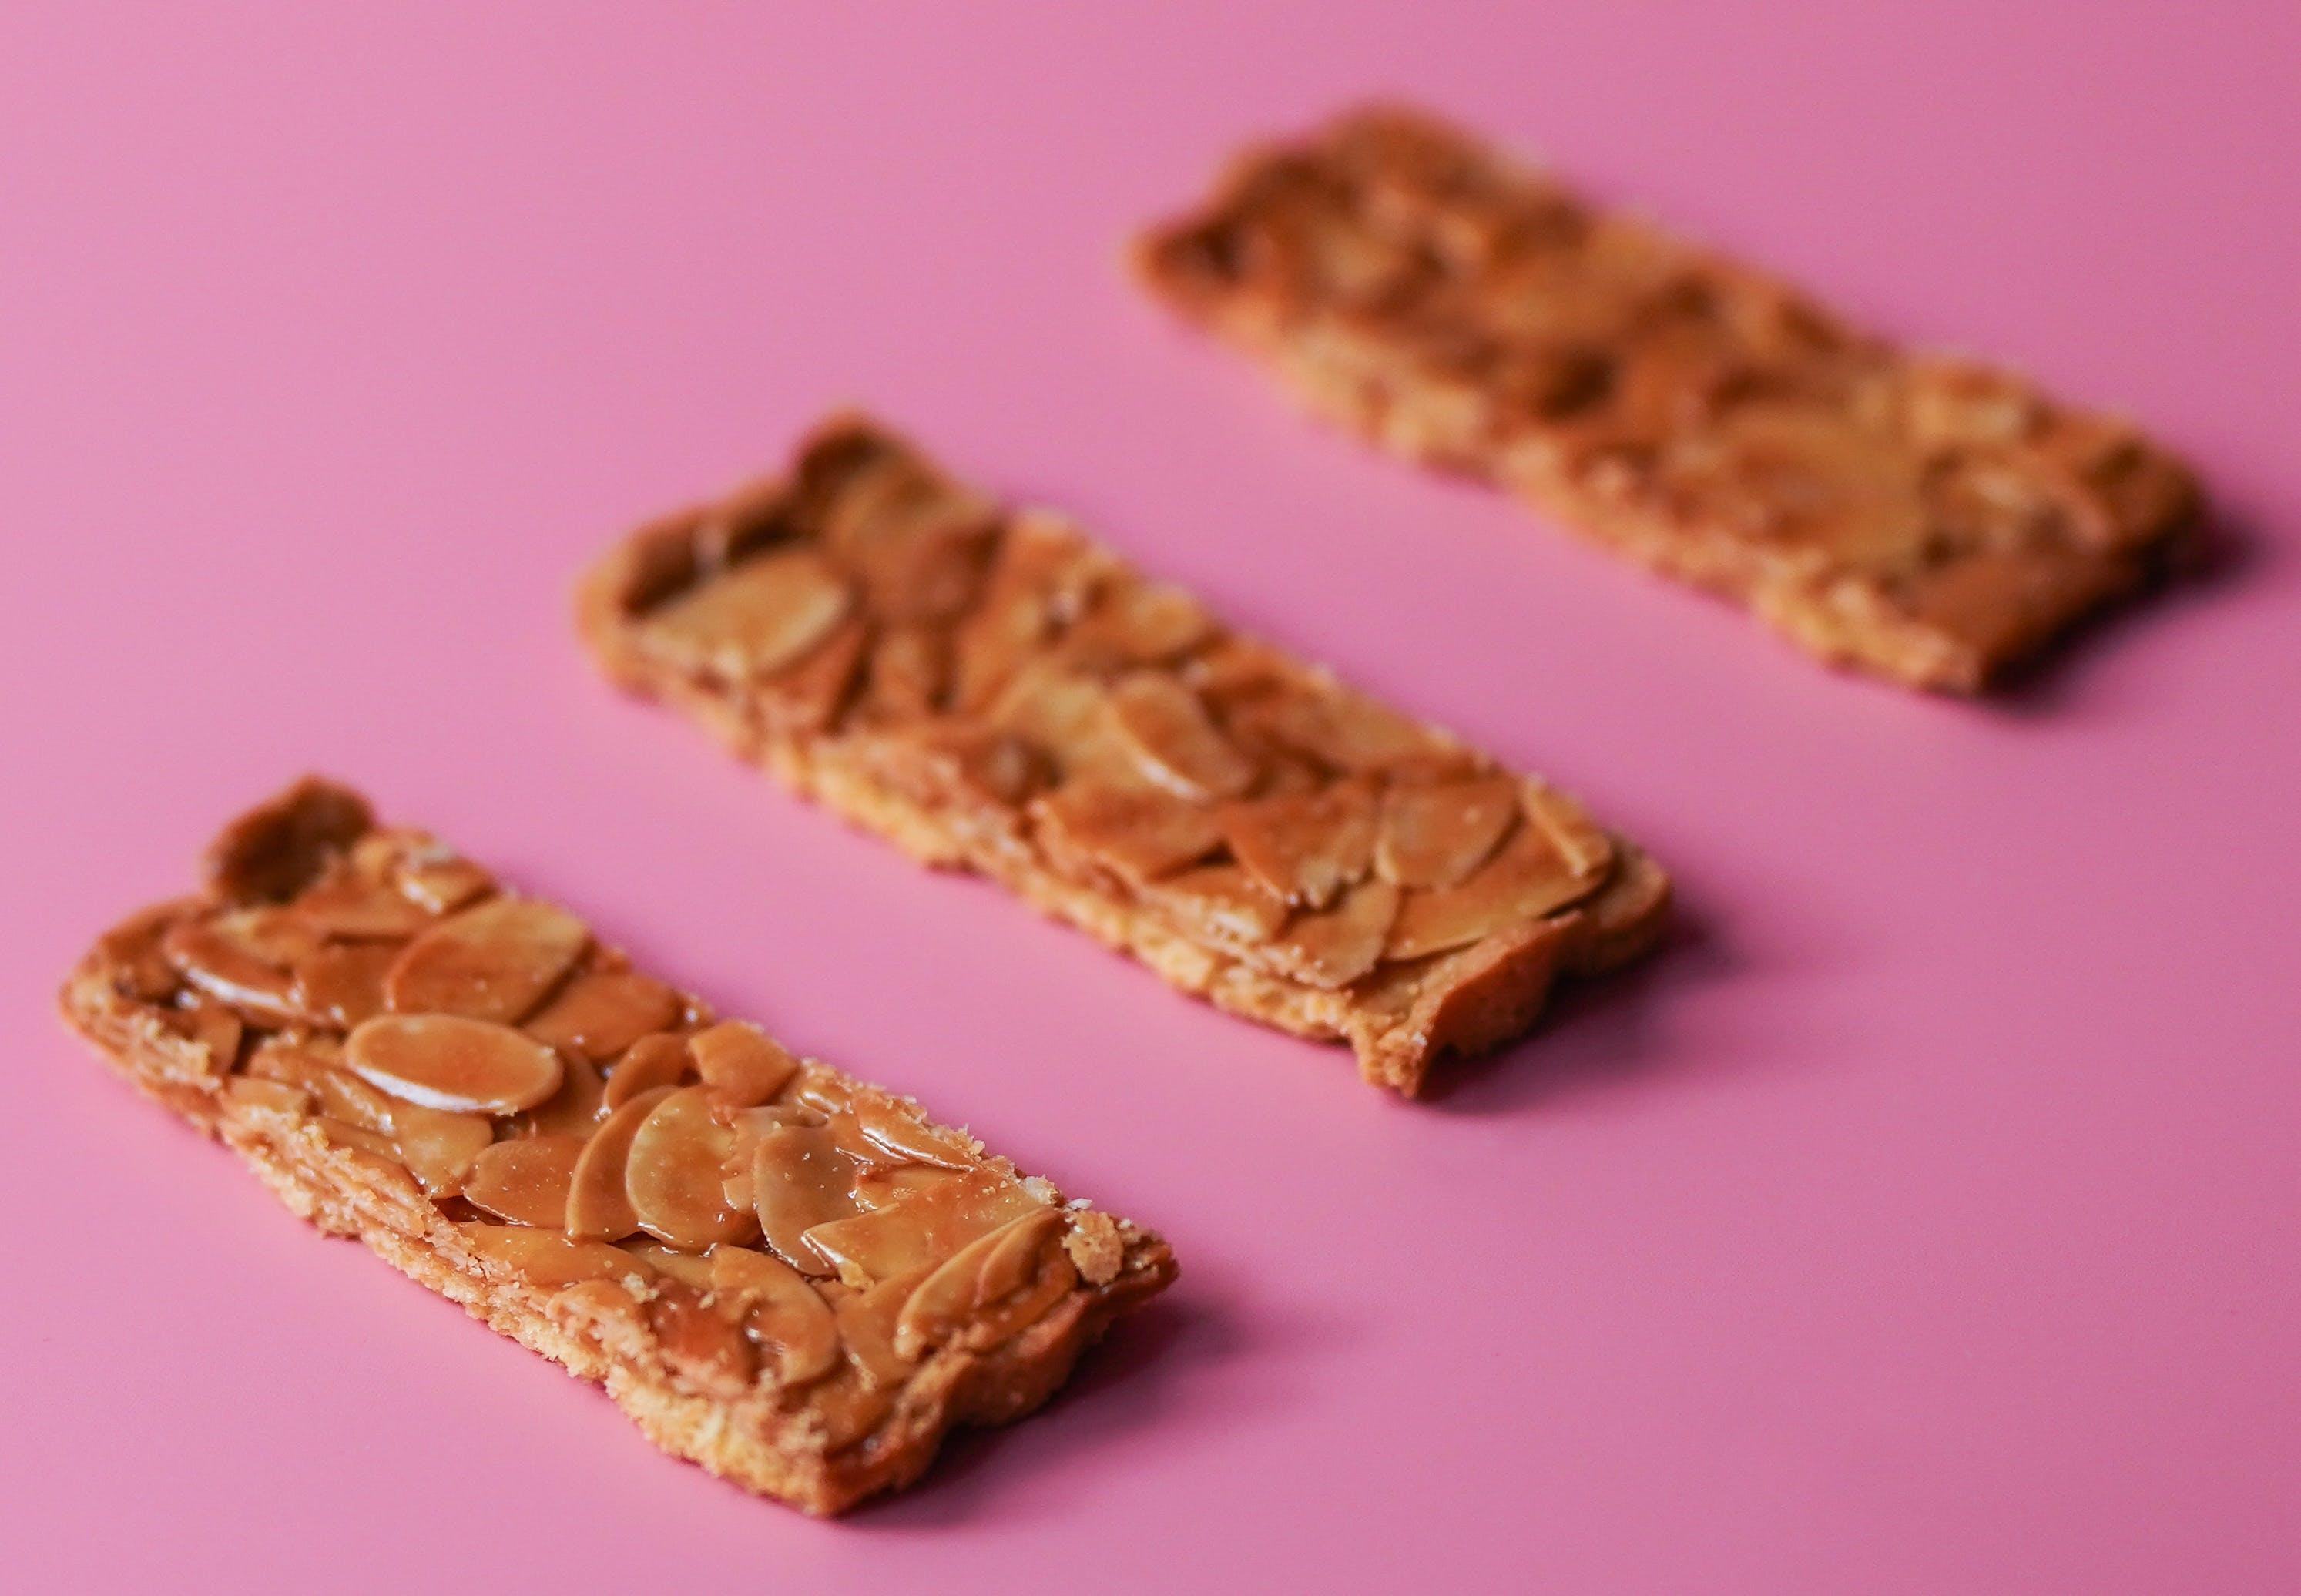 Three Caramel Biscuits